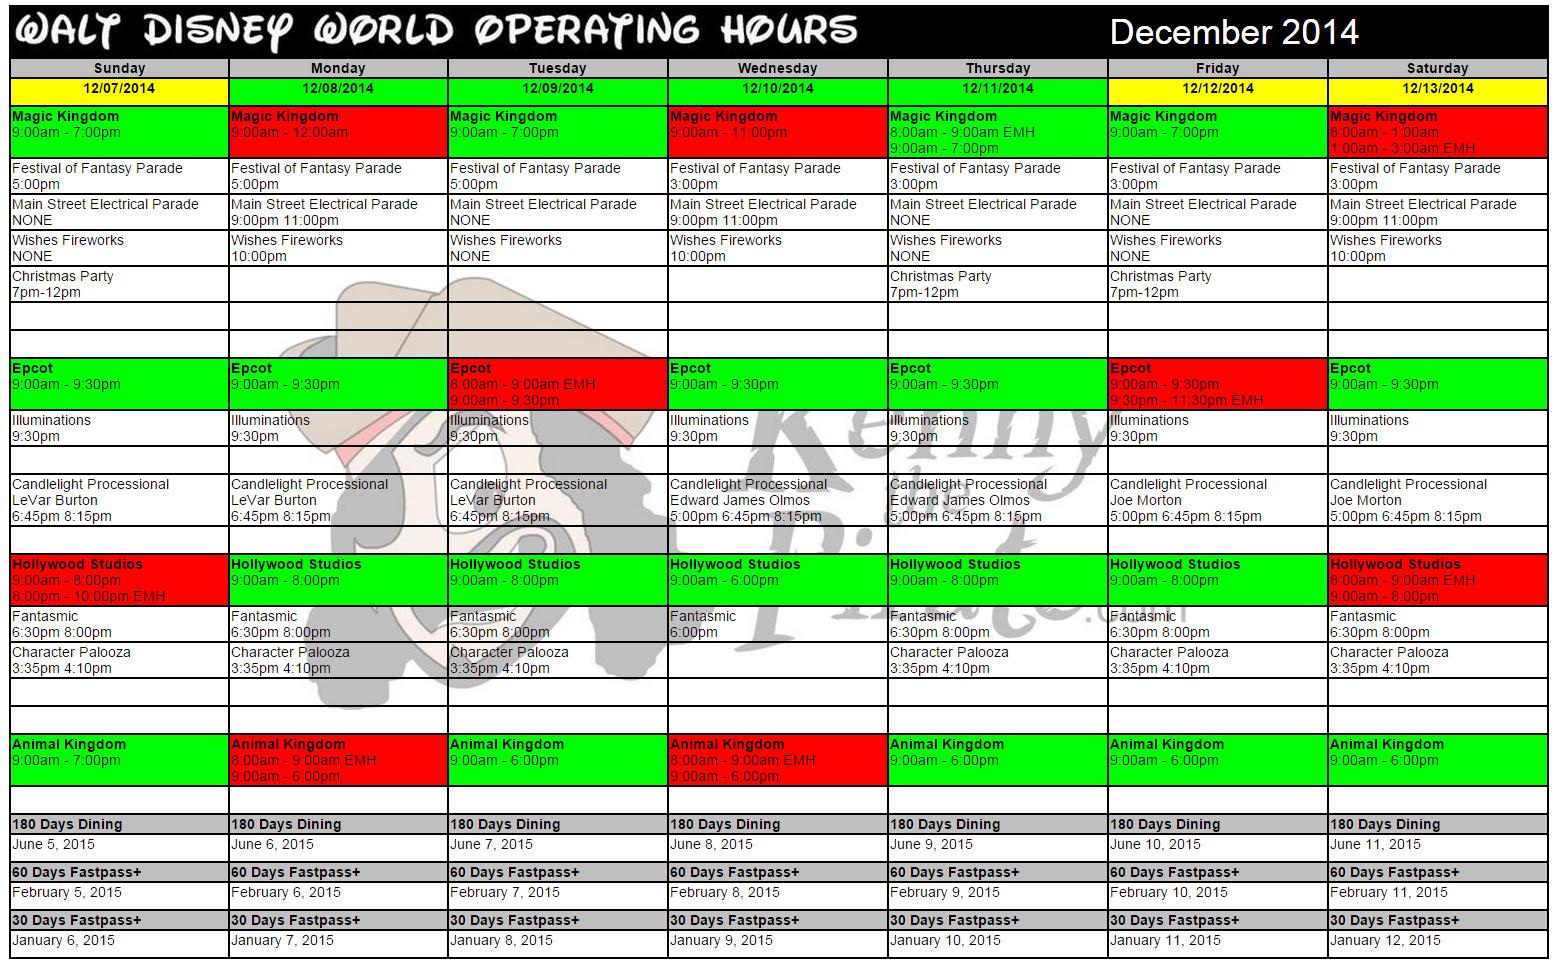 KennythePirate's December Walt Disney World Crowd Calendar with Dining and Fastpass+ Booking Dates